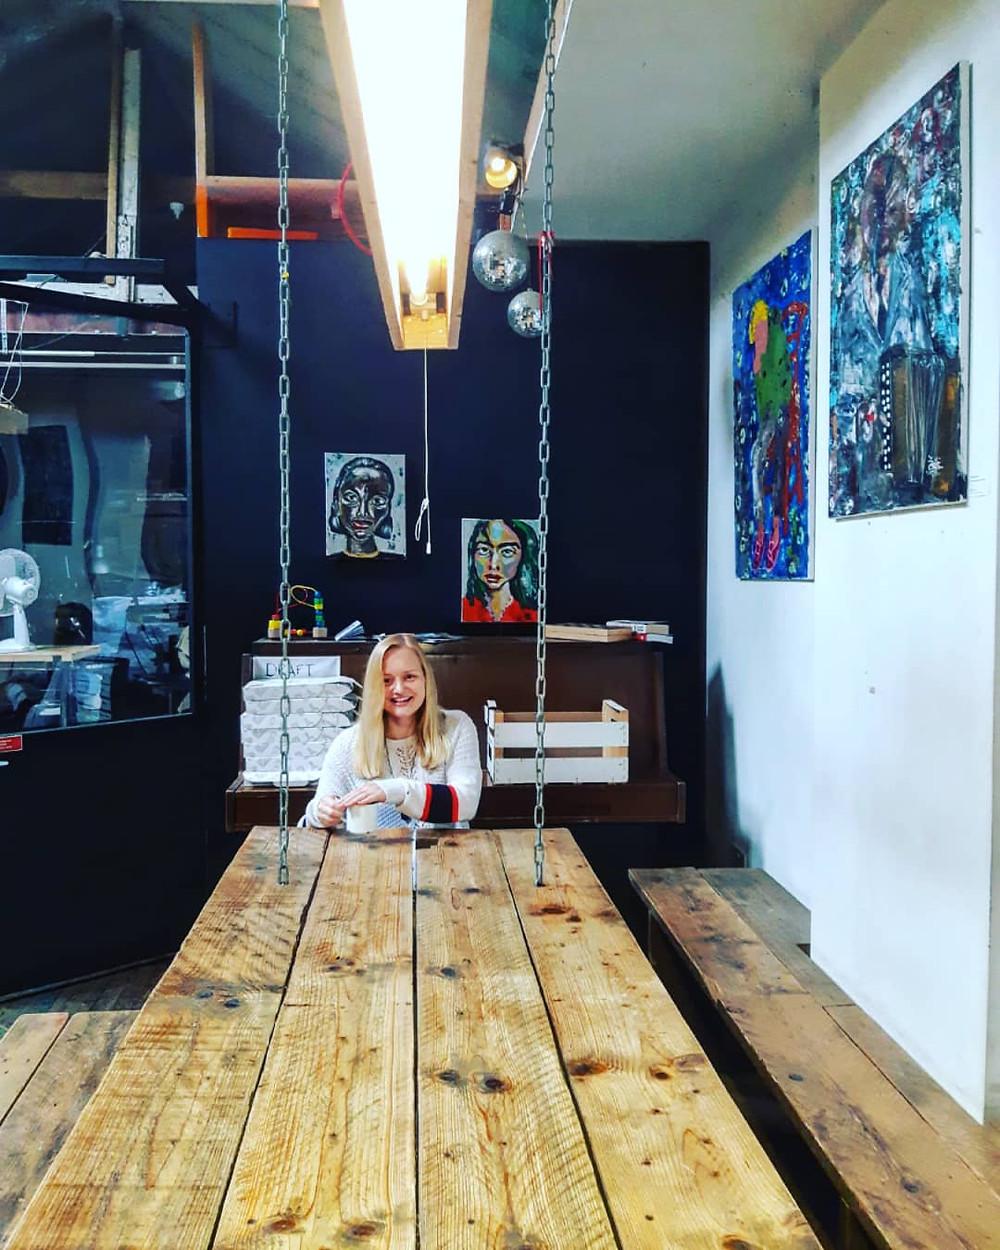 zivile kasparaviciute, vagabond, london, islington, islington coffee shop, art in islington, lithuanian artist, lietuviu menininkai